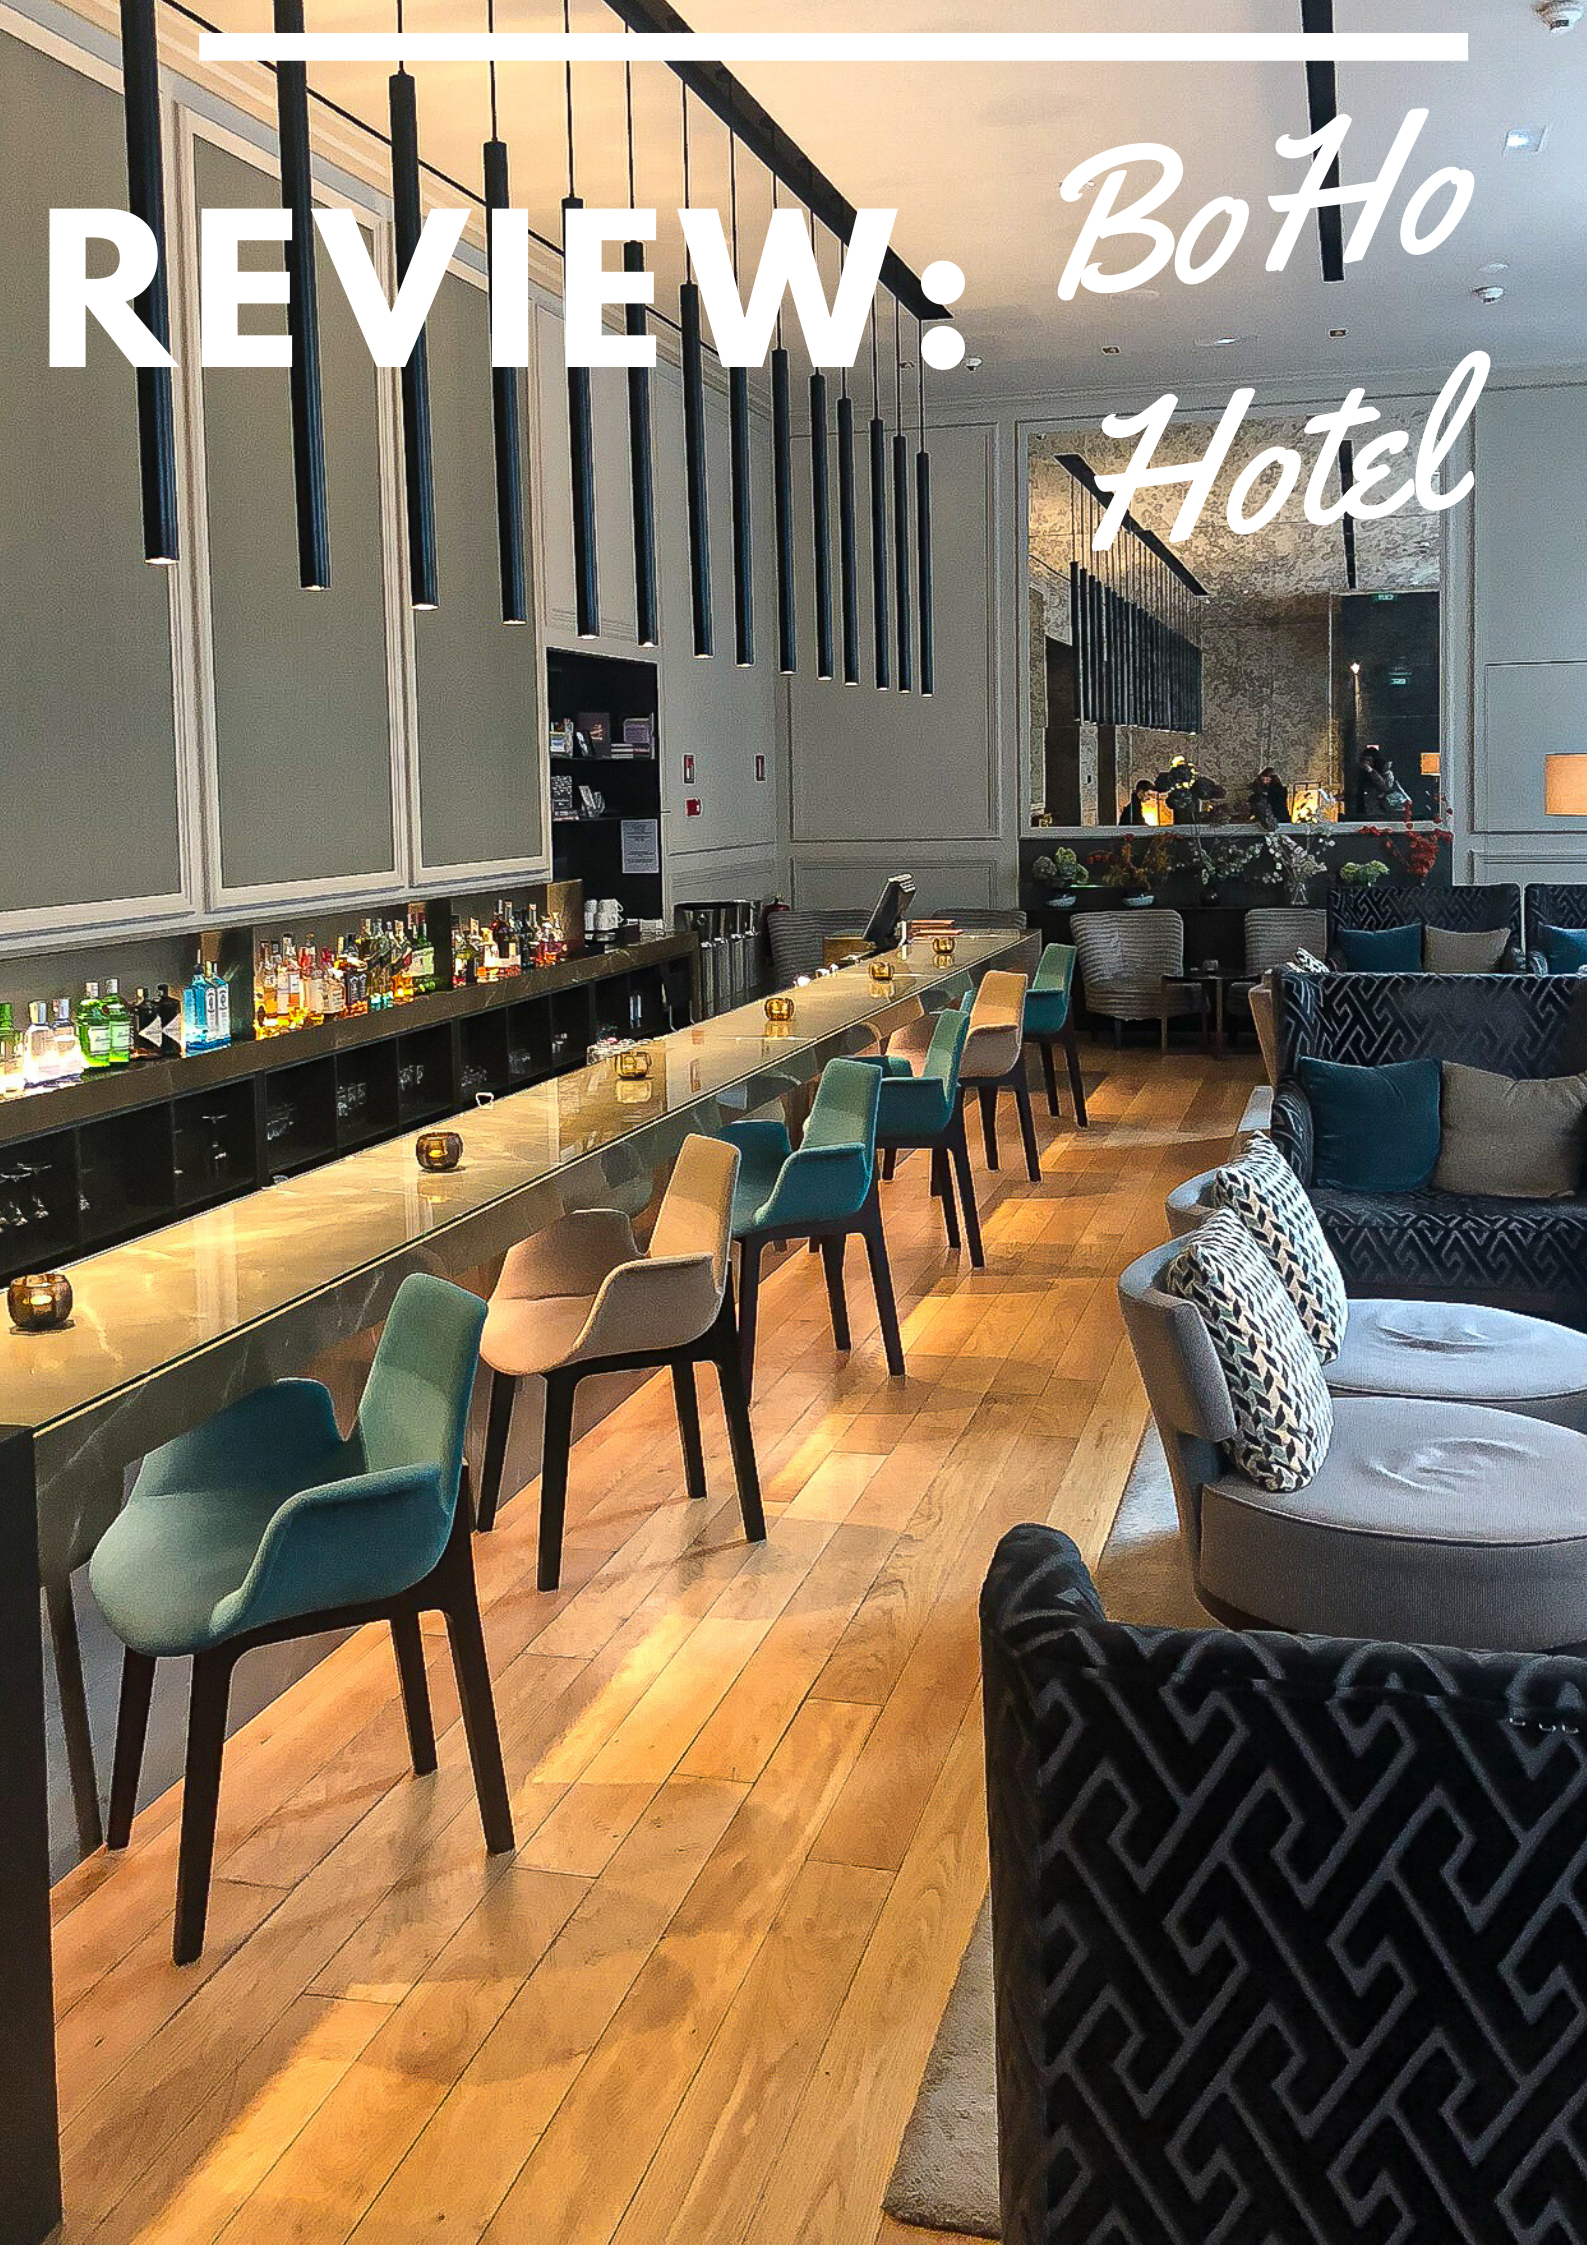 BoHo Hotel